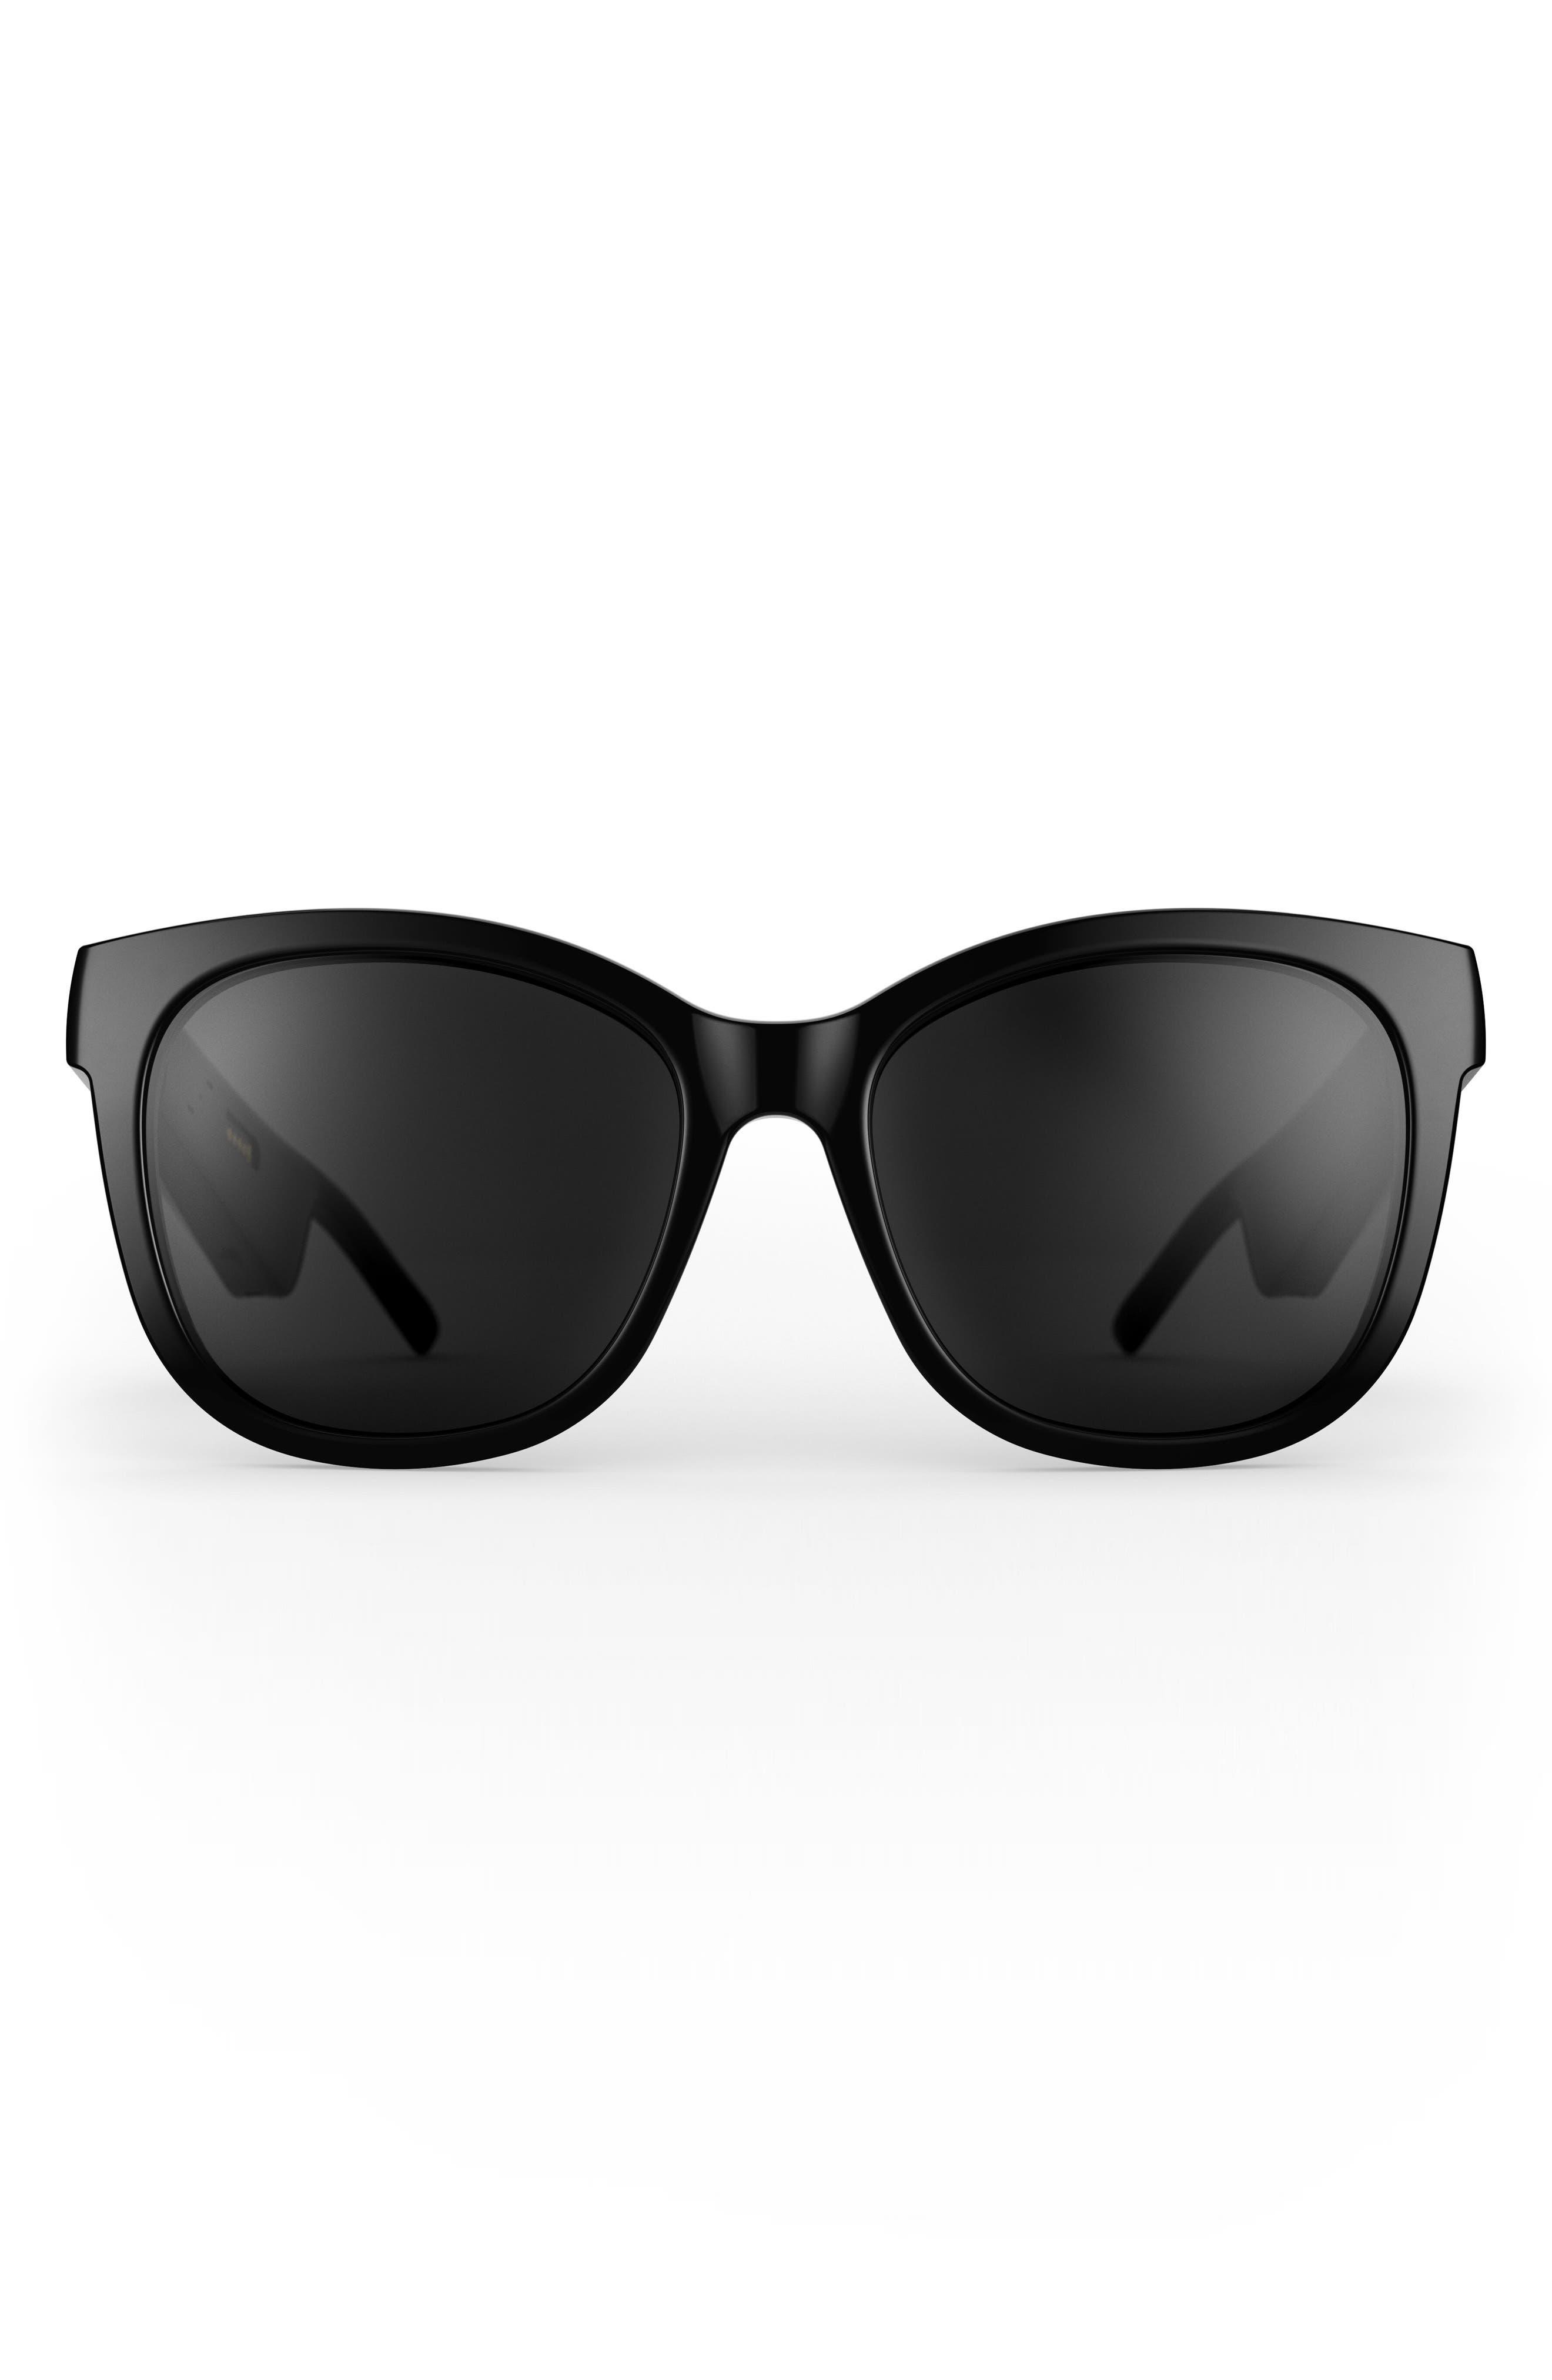 Men's Bose Frames Soprano 55mm Polarized Cat Eye Audio Sunglasses